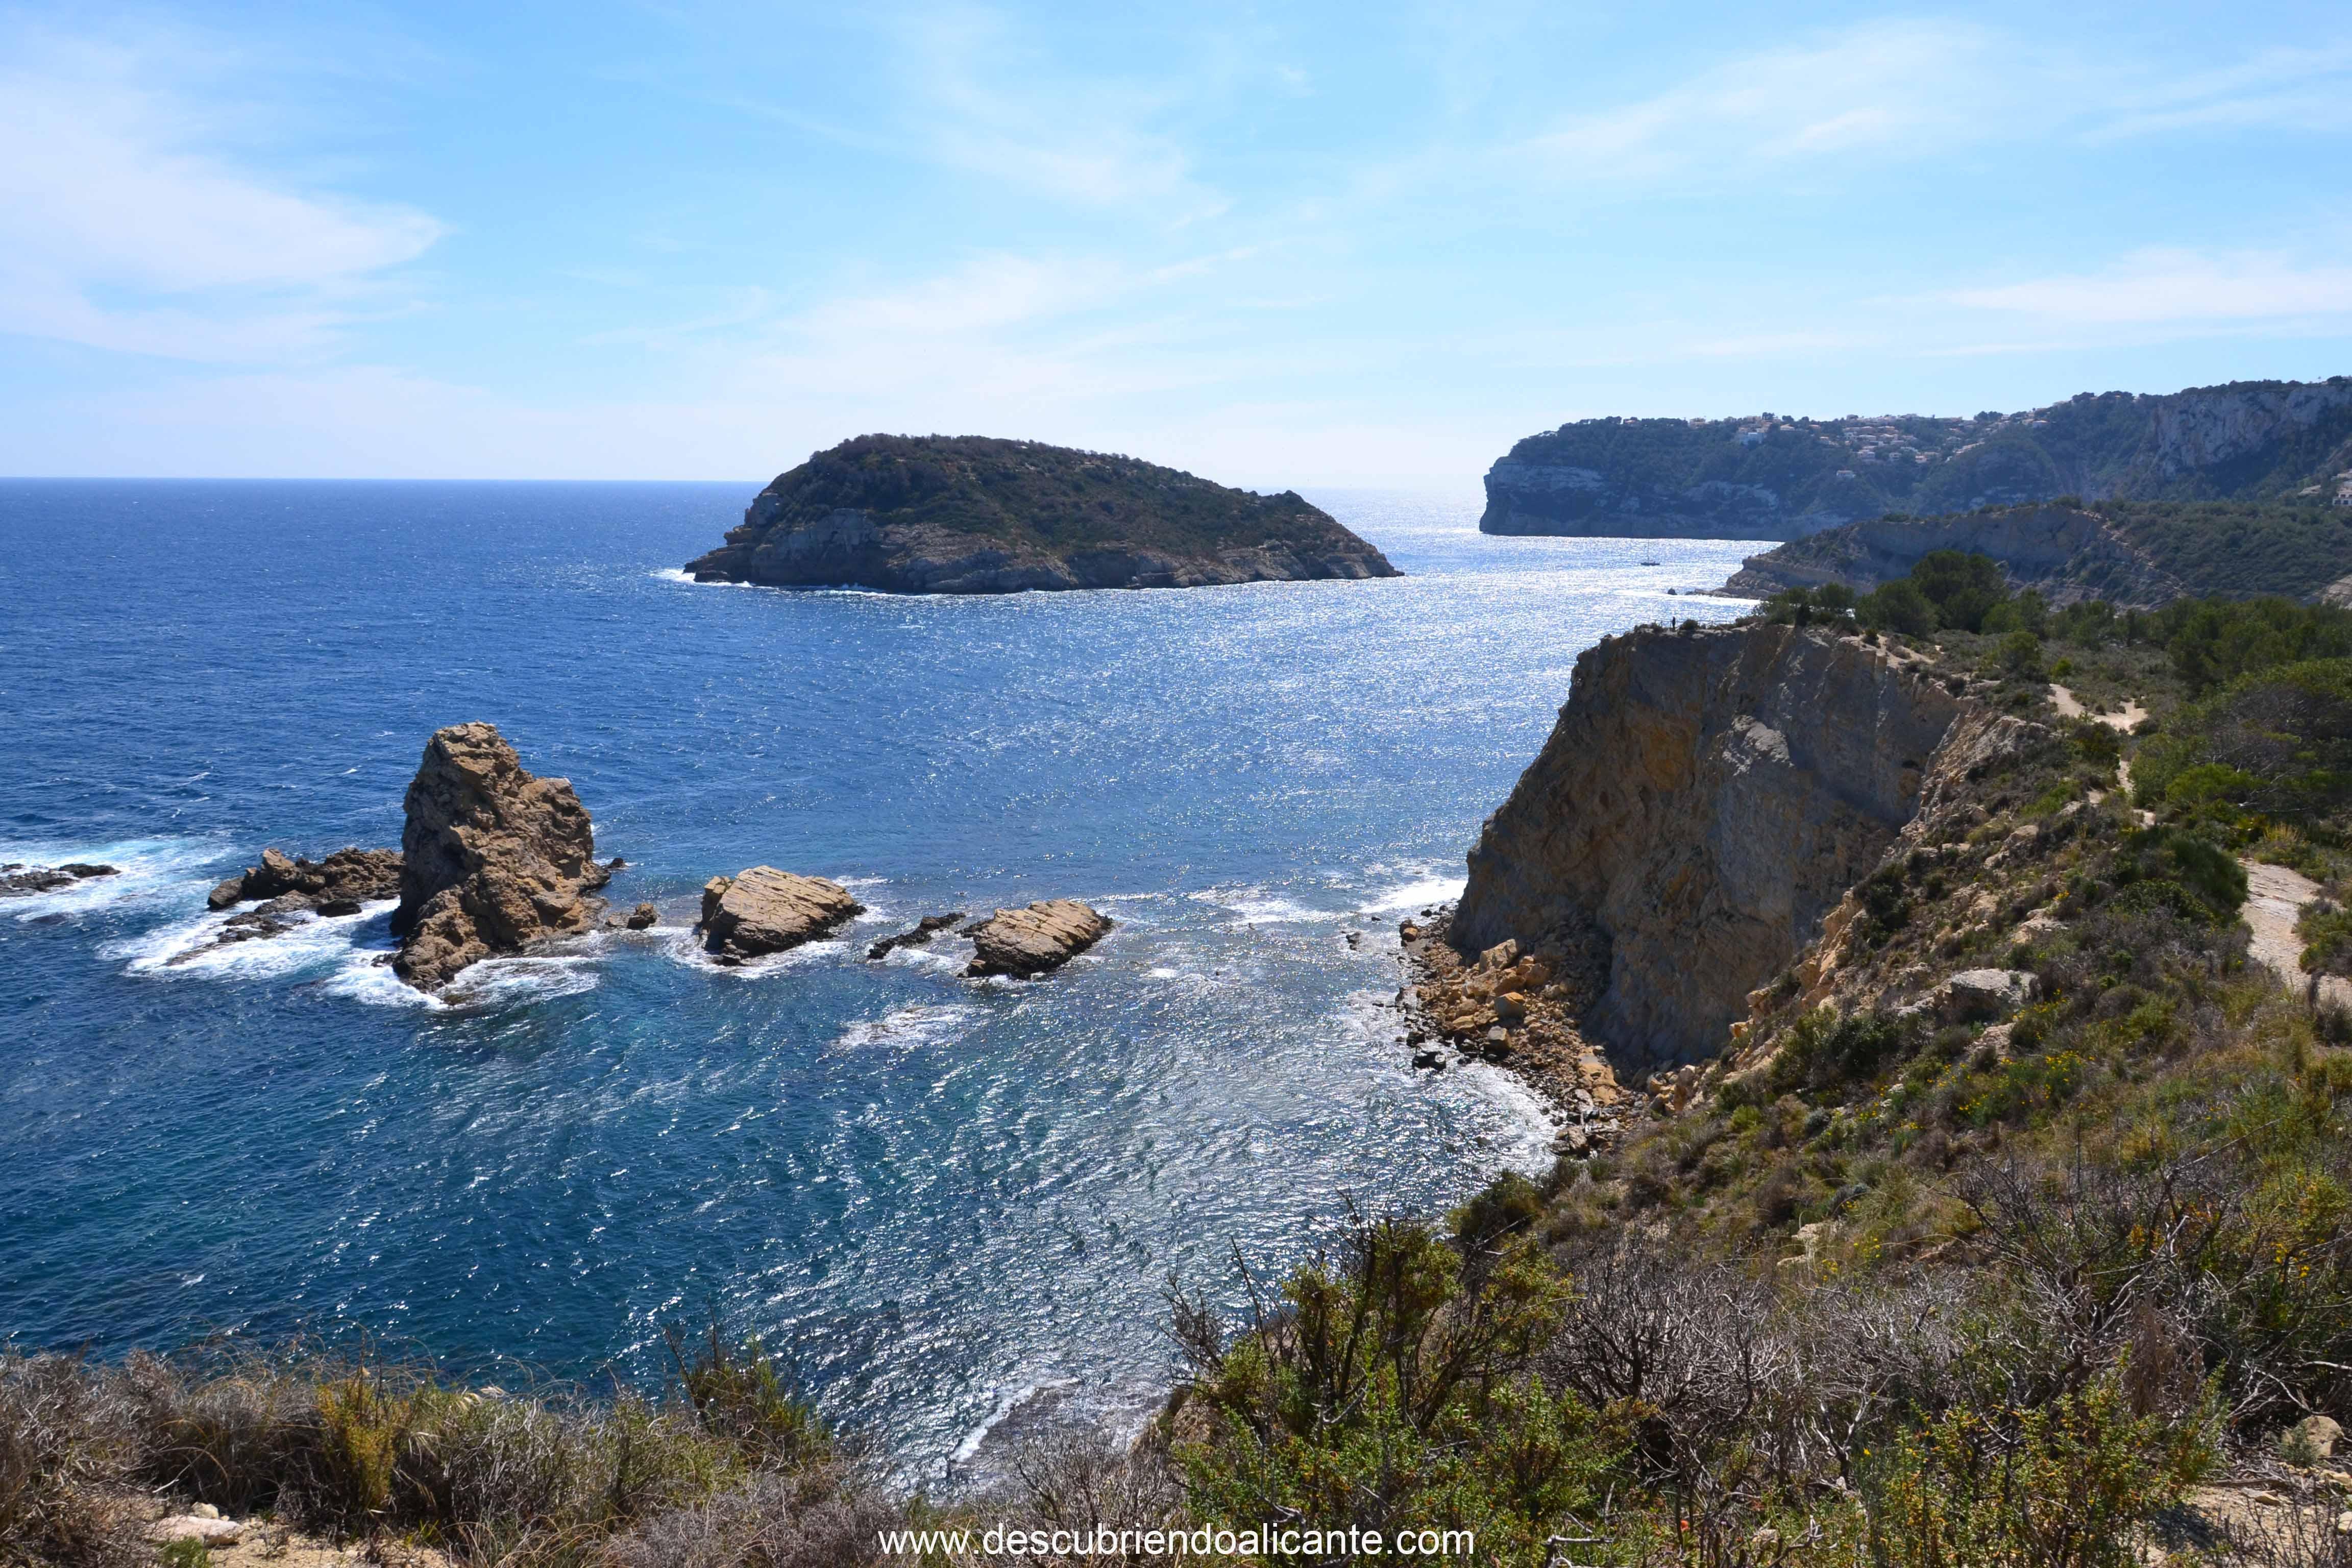 vistas-portitxol-desde-cap-prim-javea-landscape